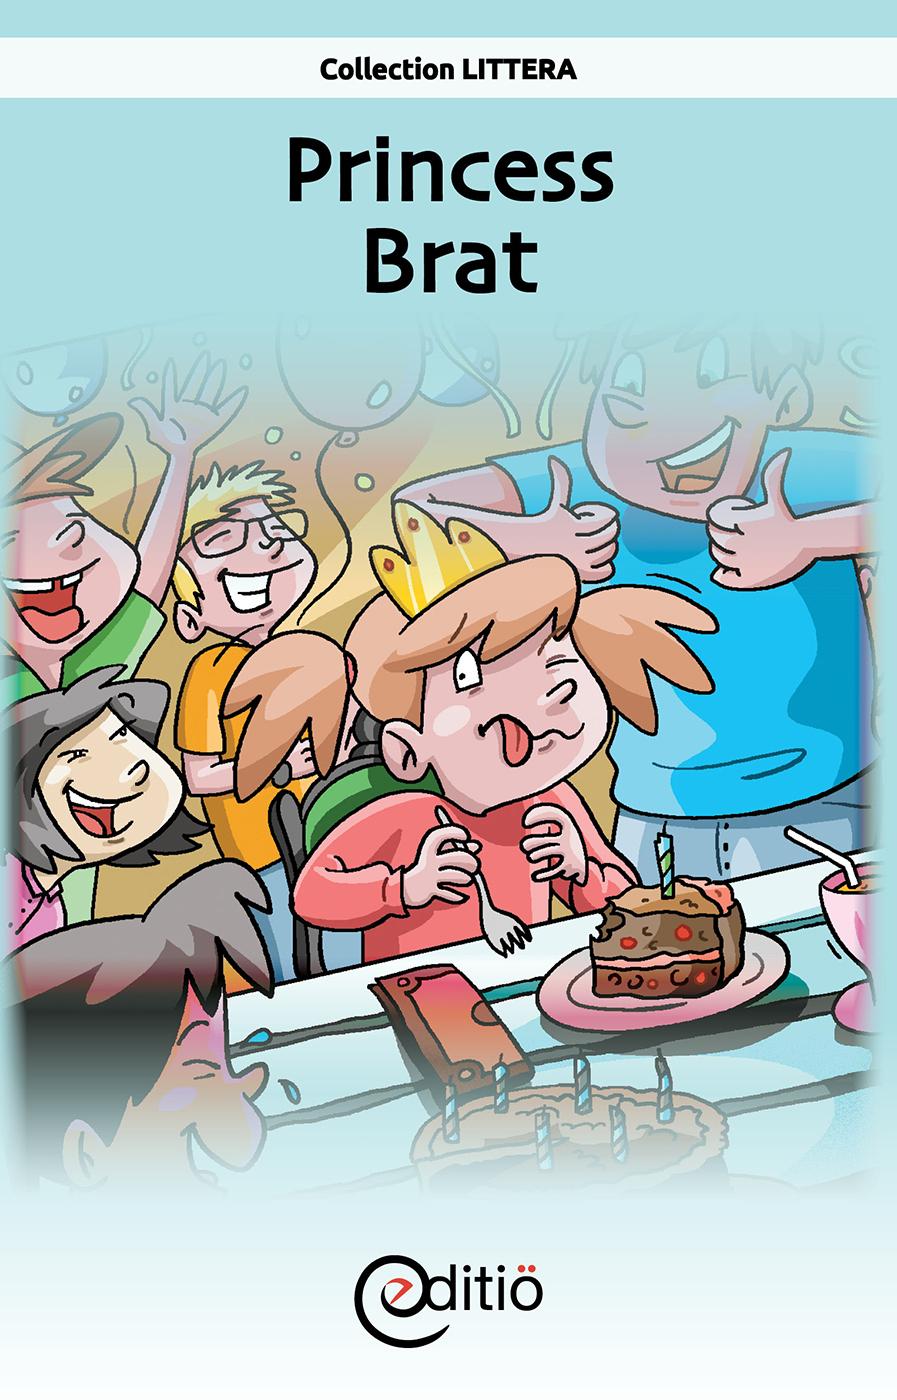 Princess Brat